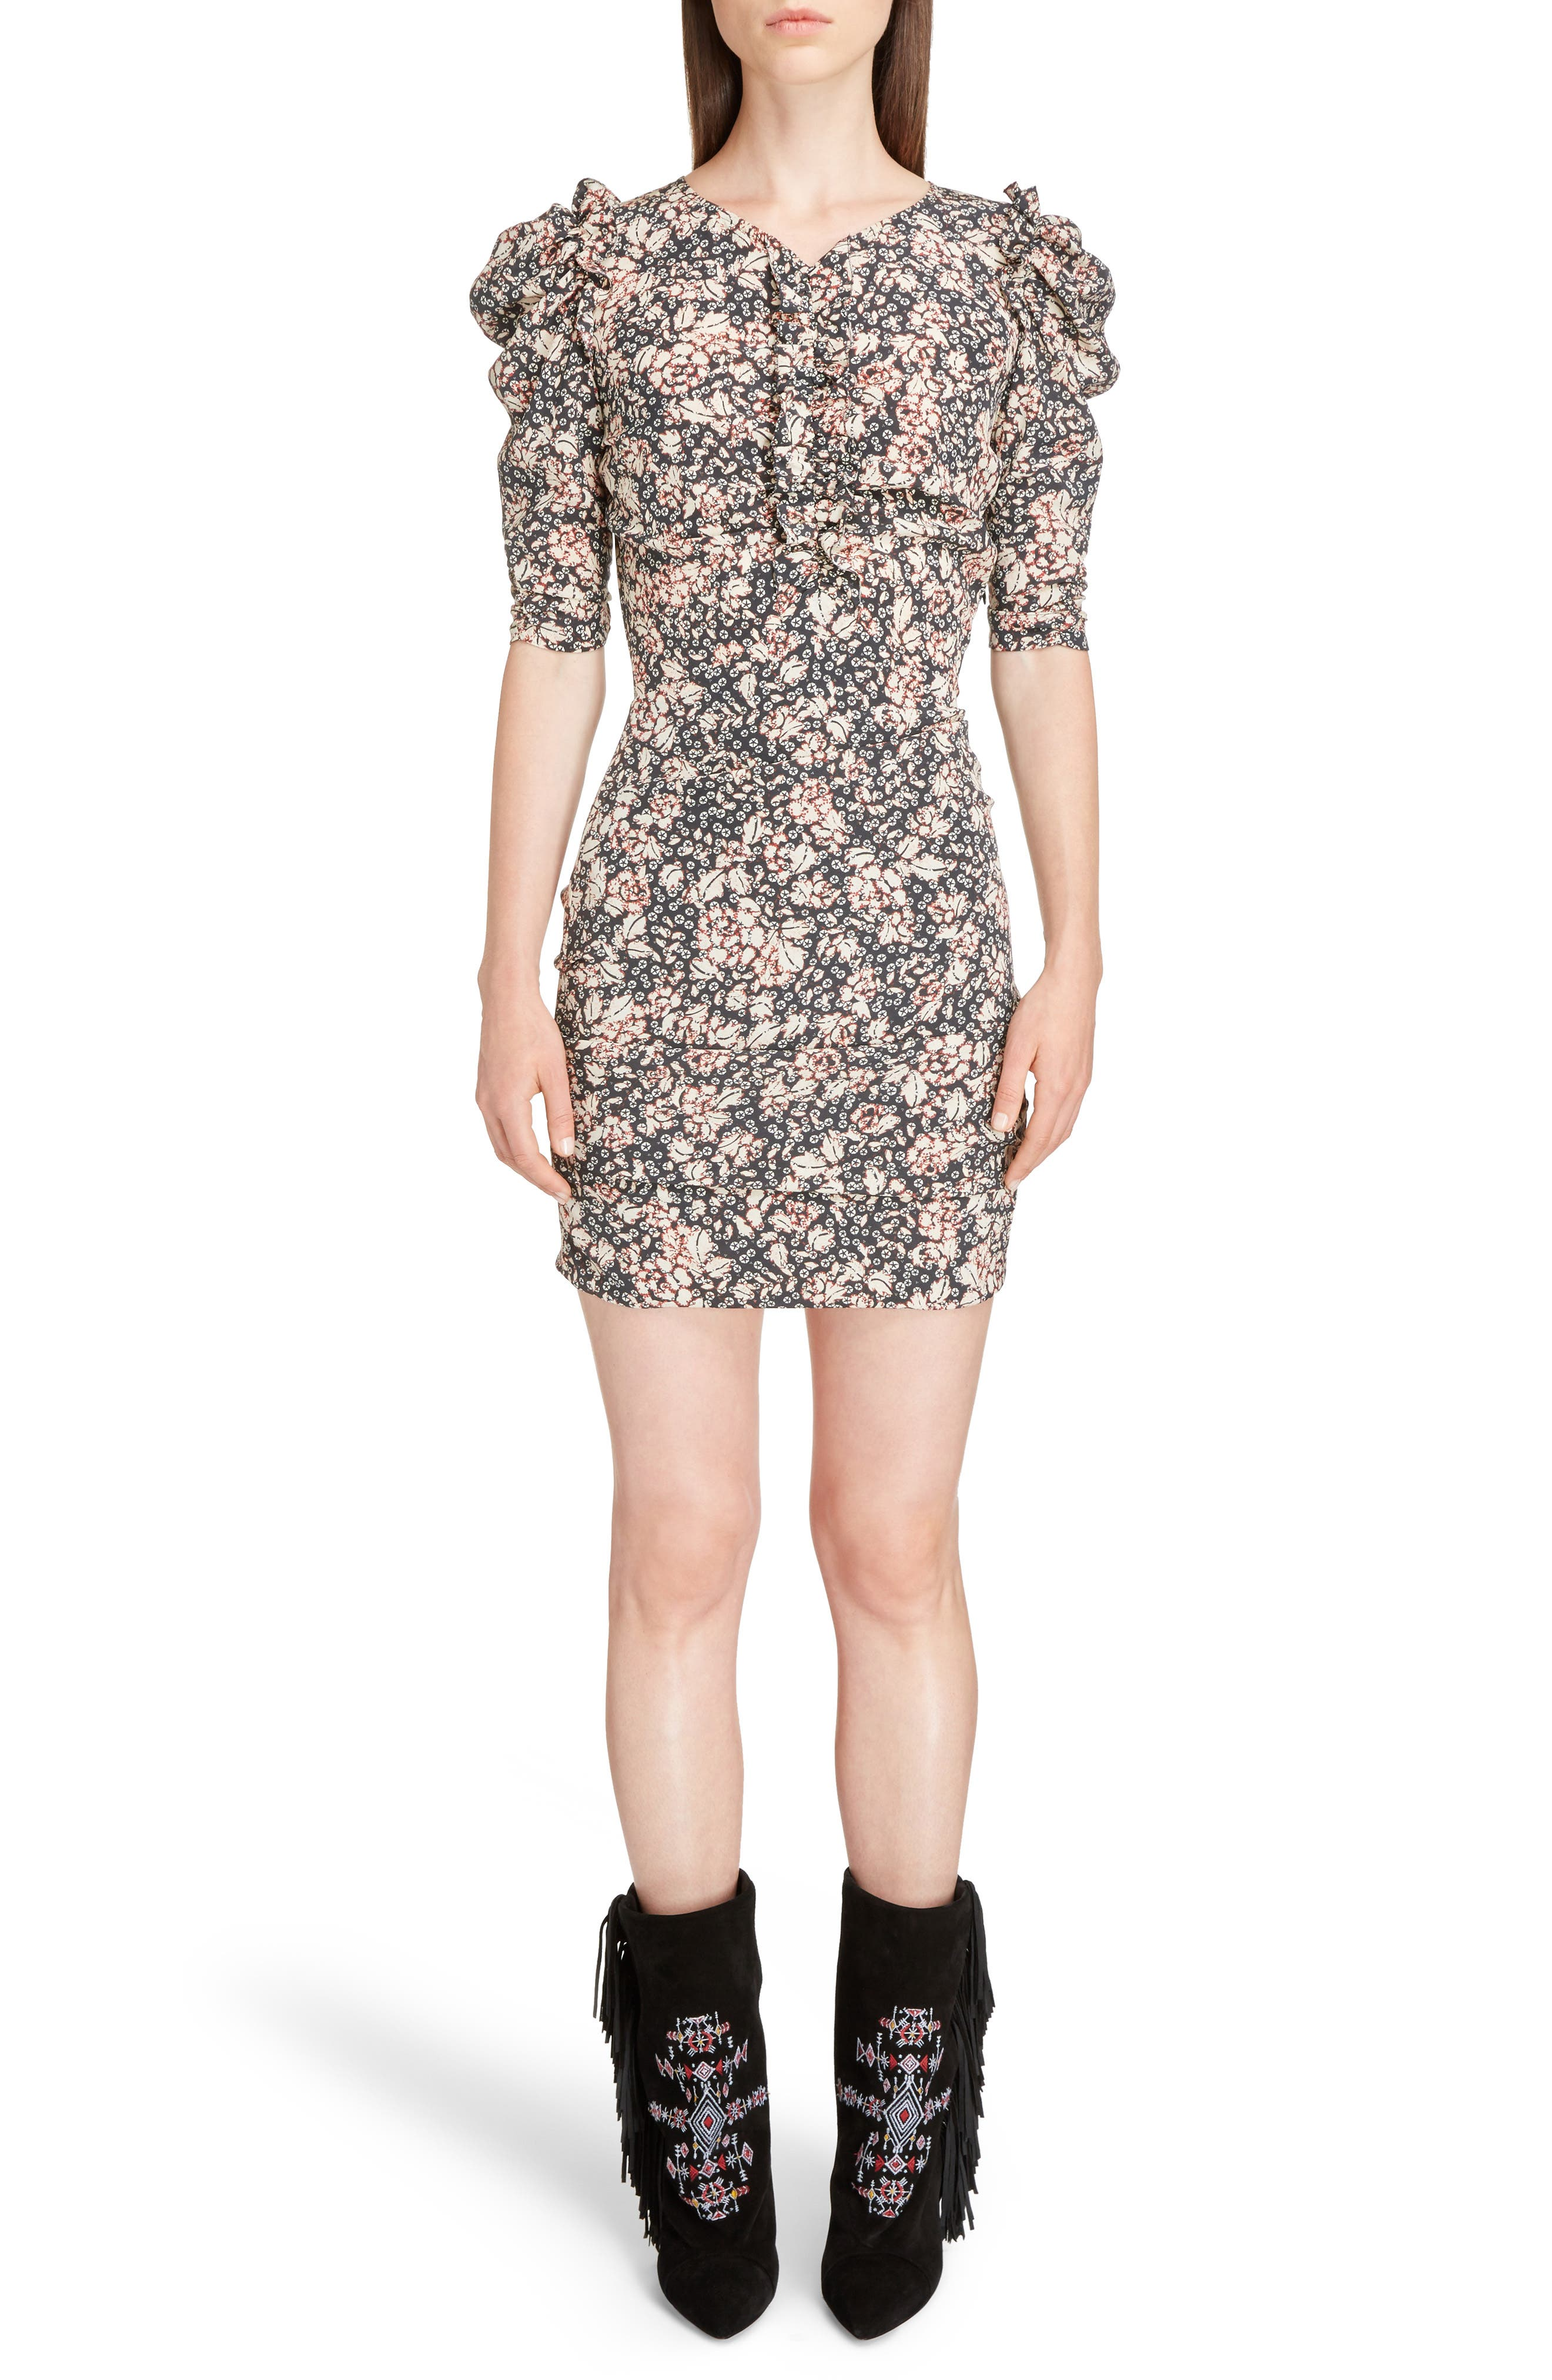 Alternate Image 1 Selected - Isabel Marant Brizia Floral Print Stretch Silk Puff Sleeve Dress